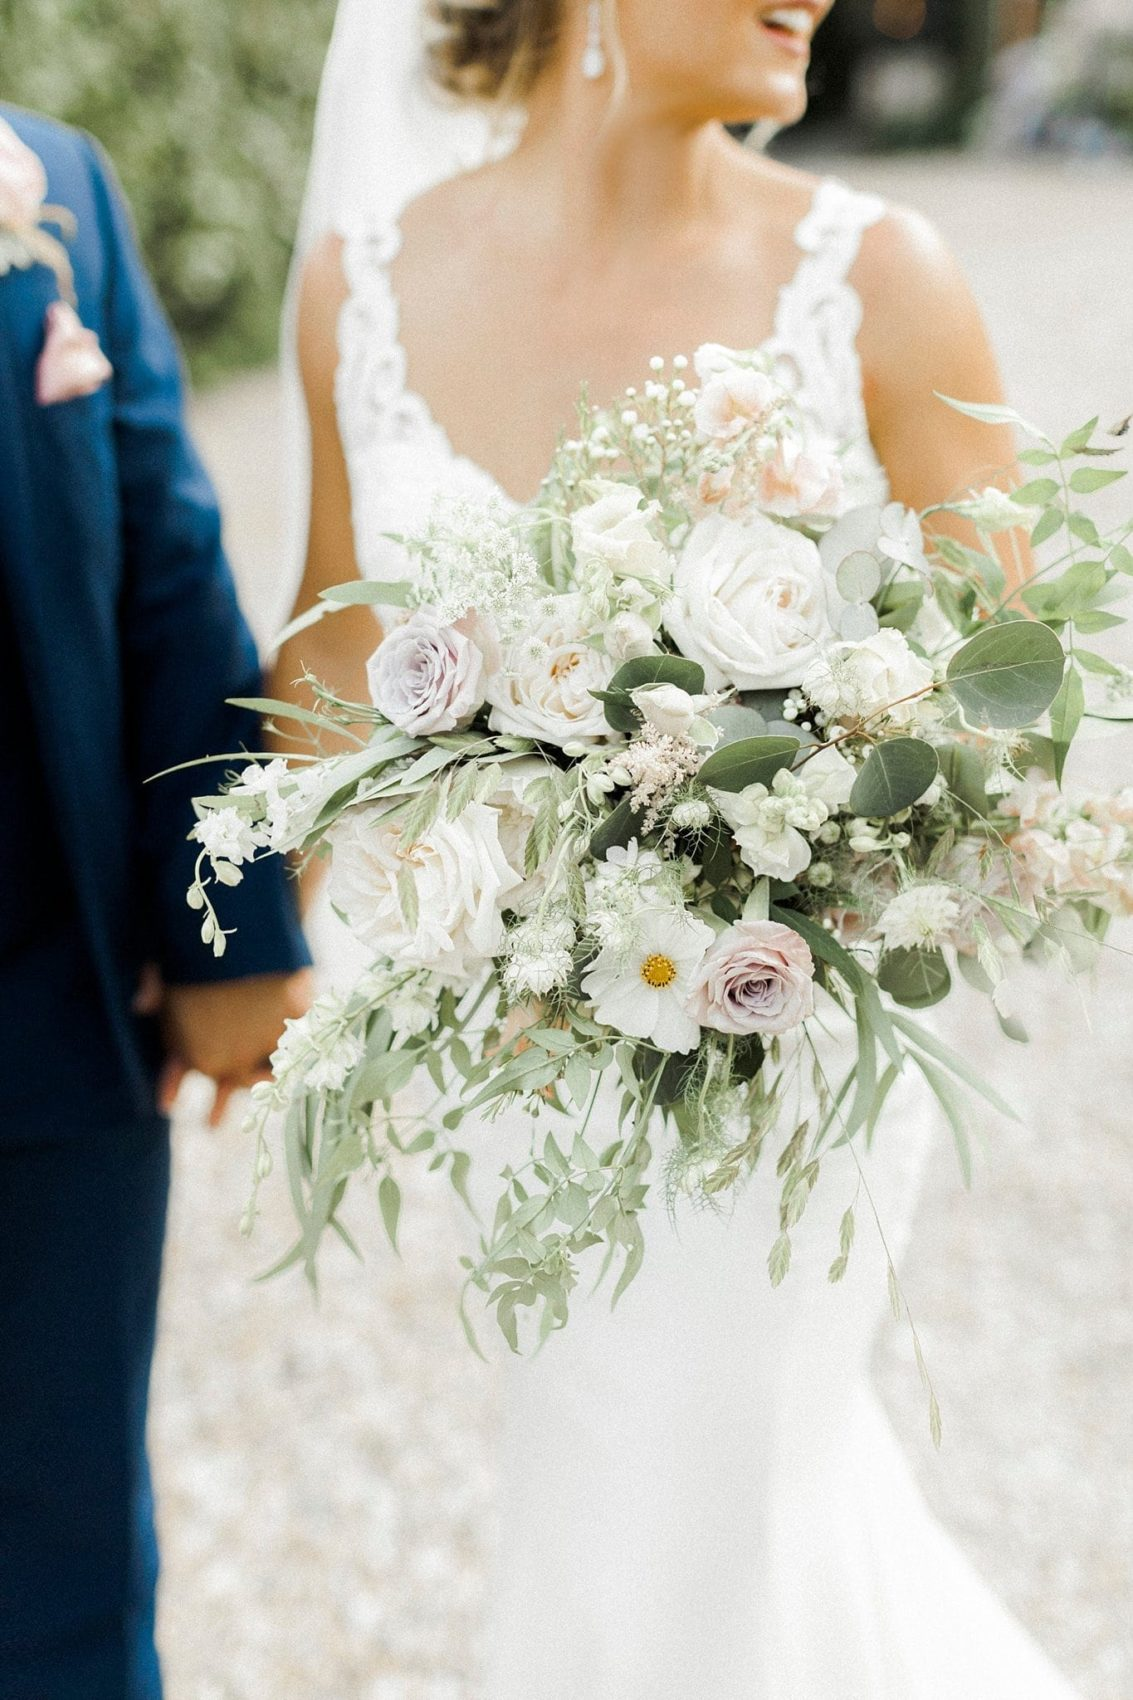 wild bouquet, flowers, wedding, bride & groom, dusky pink, ivory, foliage, stunning